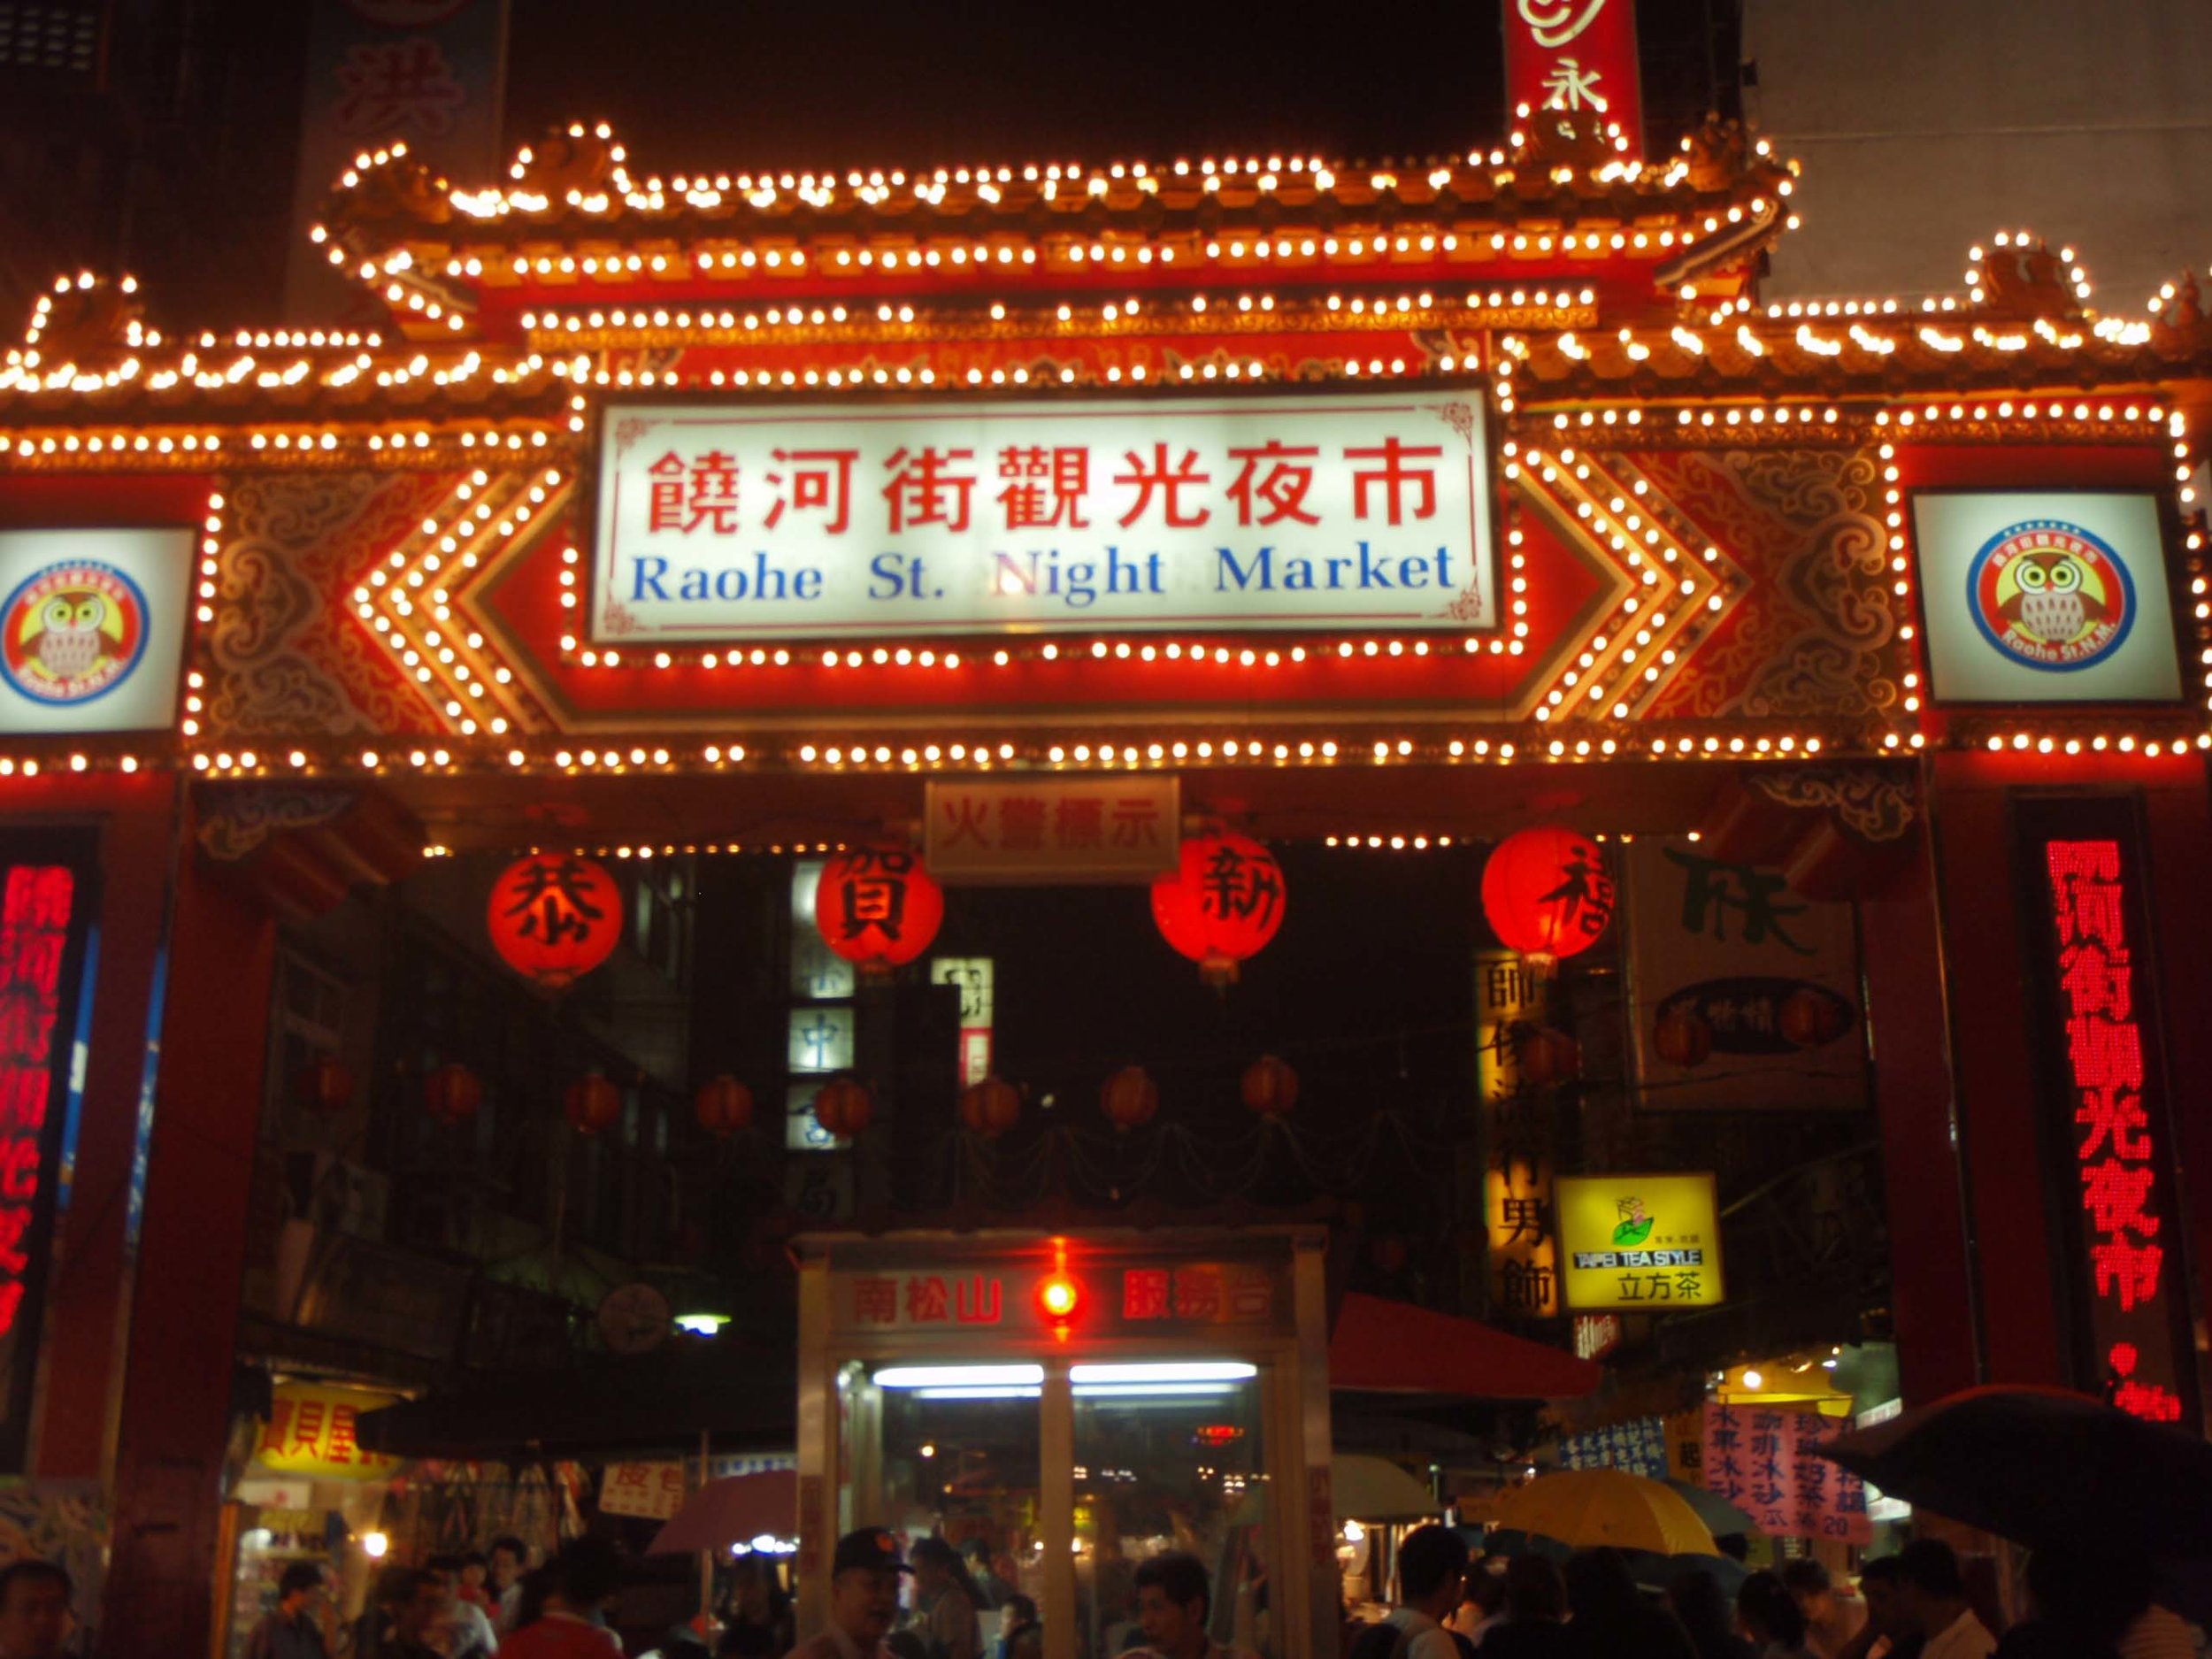 Raohe St. night market.jpg